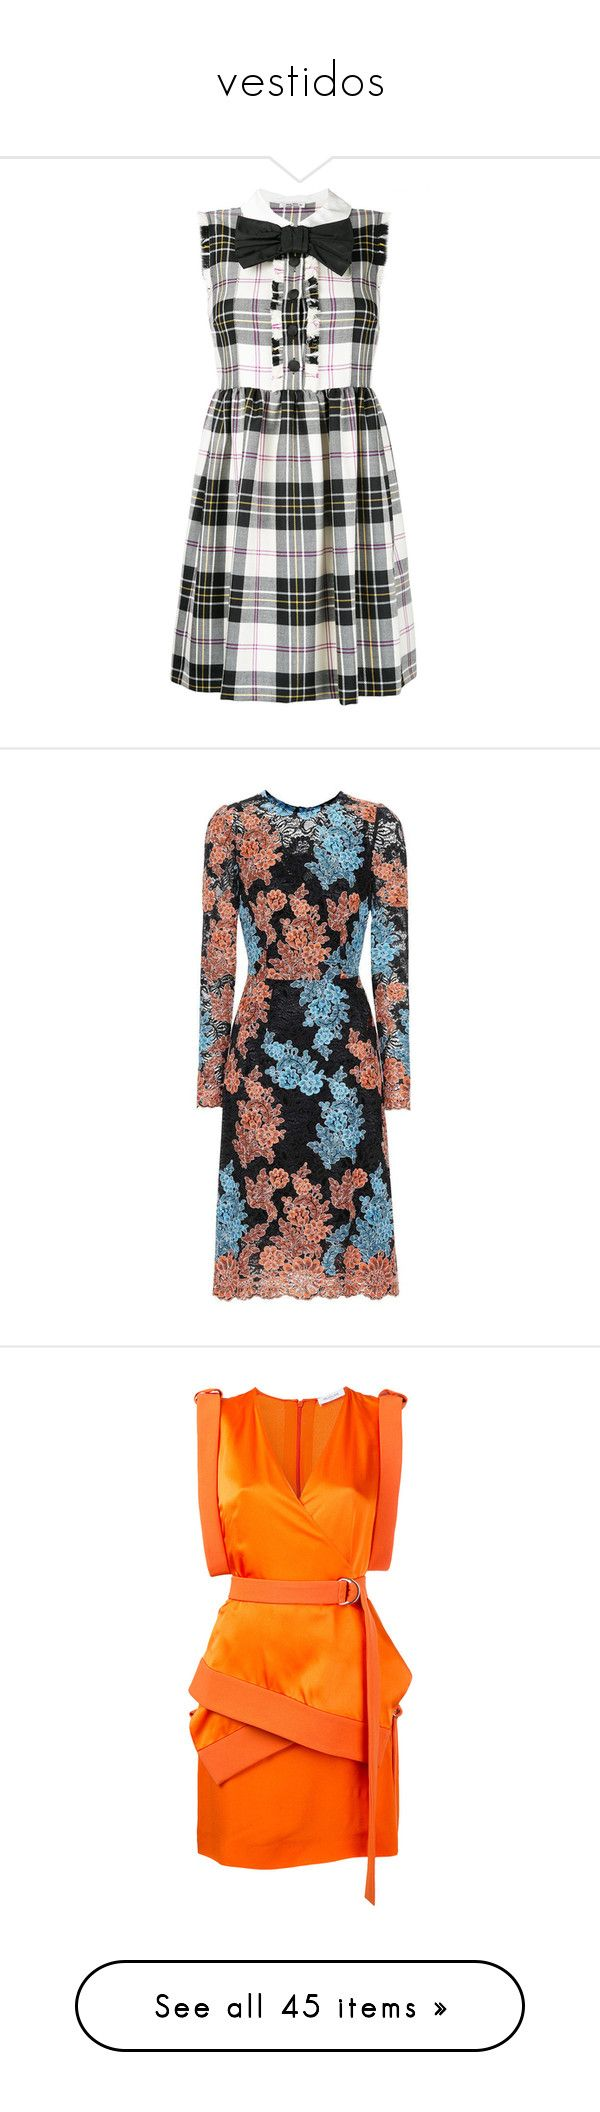 """vestidos"" by carlymailin ❤ liked on Polyvore featuring dresses, shirring dress, tartan dress, multi coloured dress, shirred dress, miu miu dress, multicoloured, multicolored dress, embroidered lace dress and dolce gabbana dress"